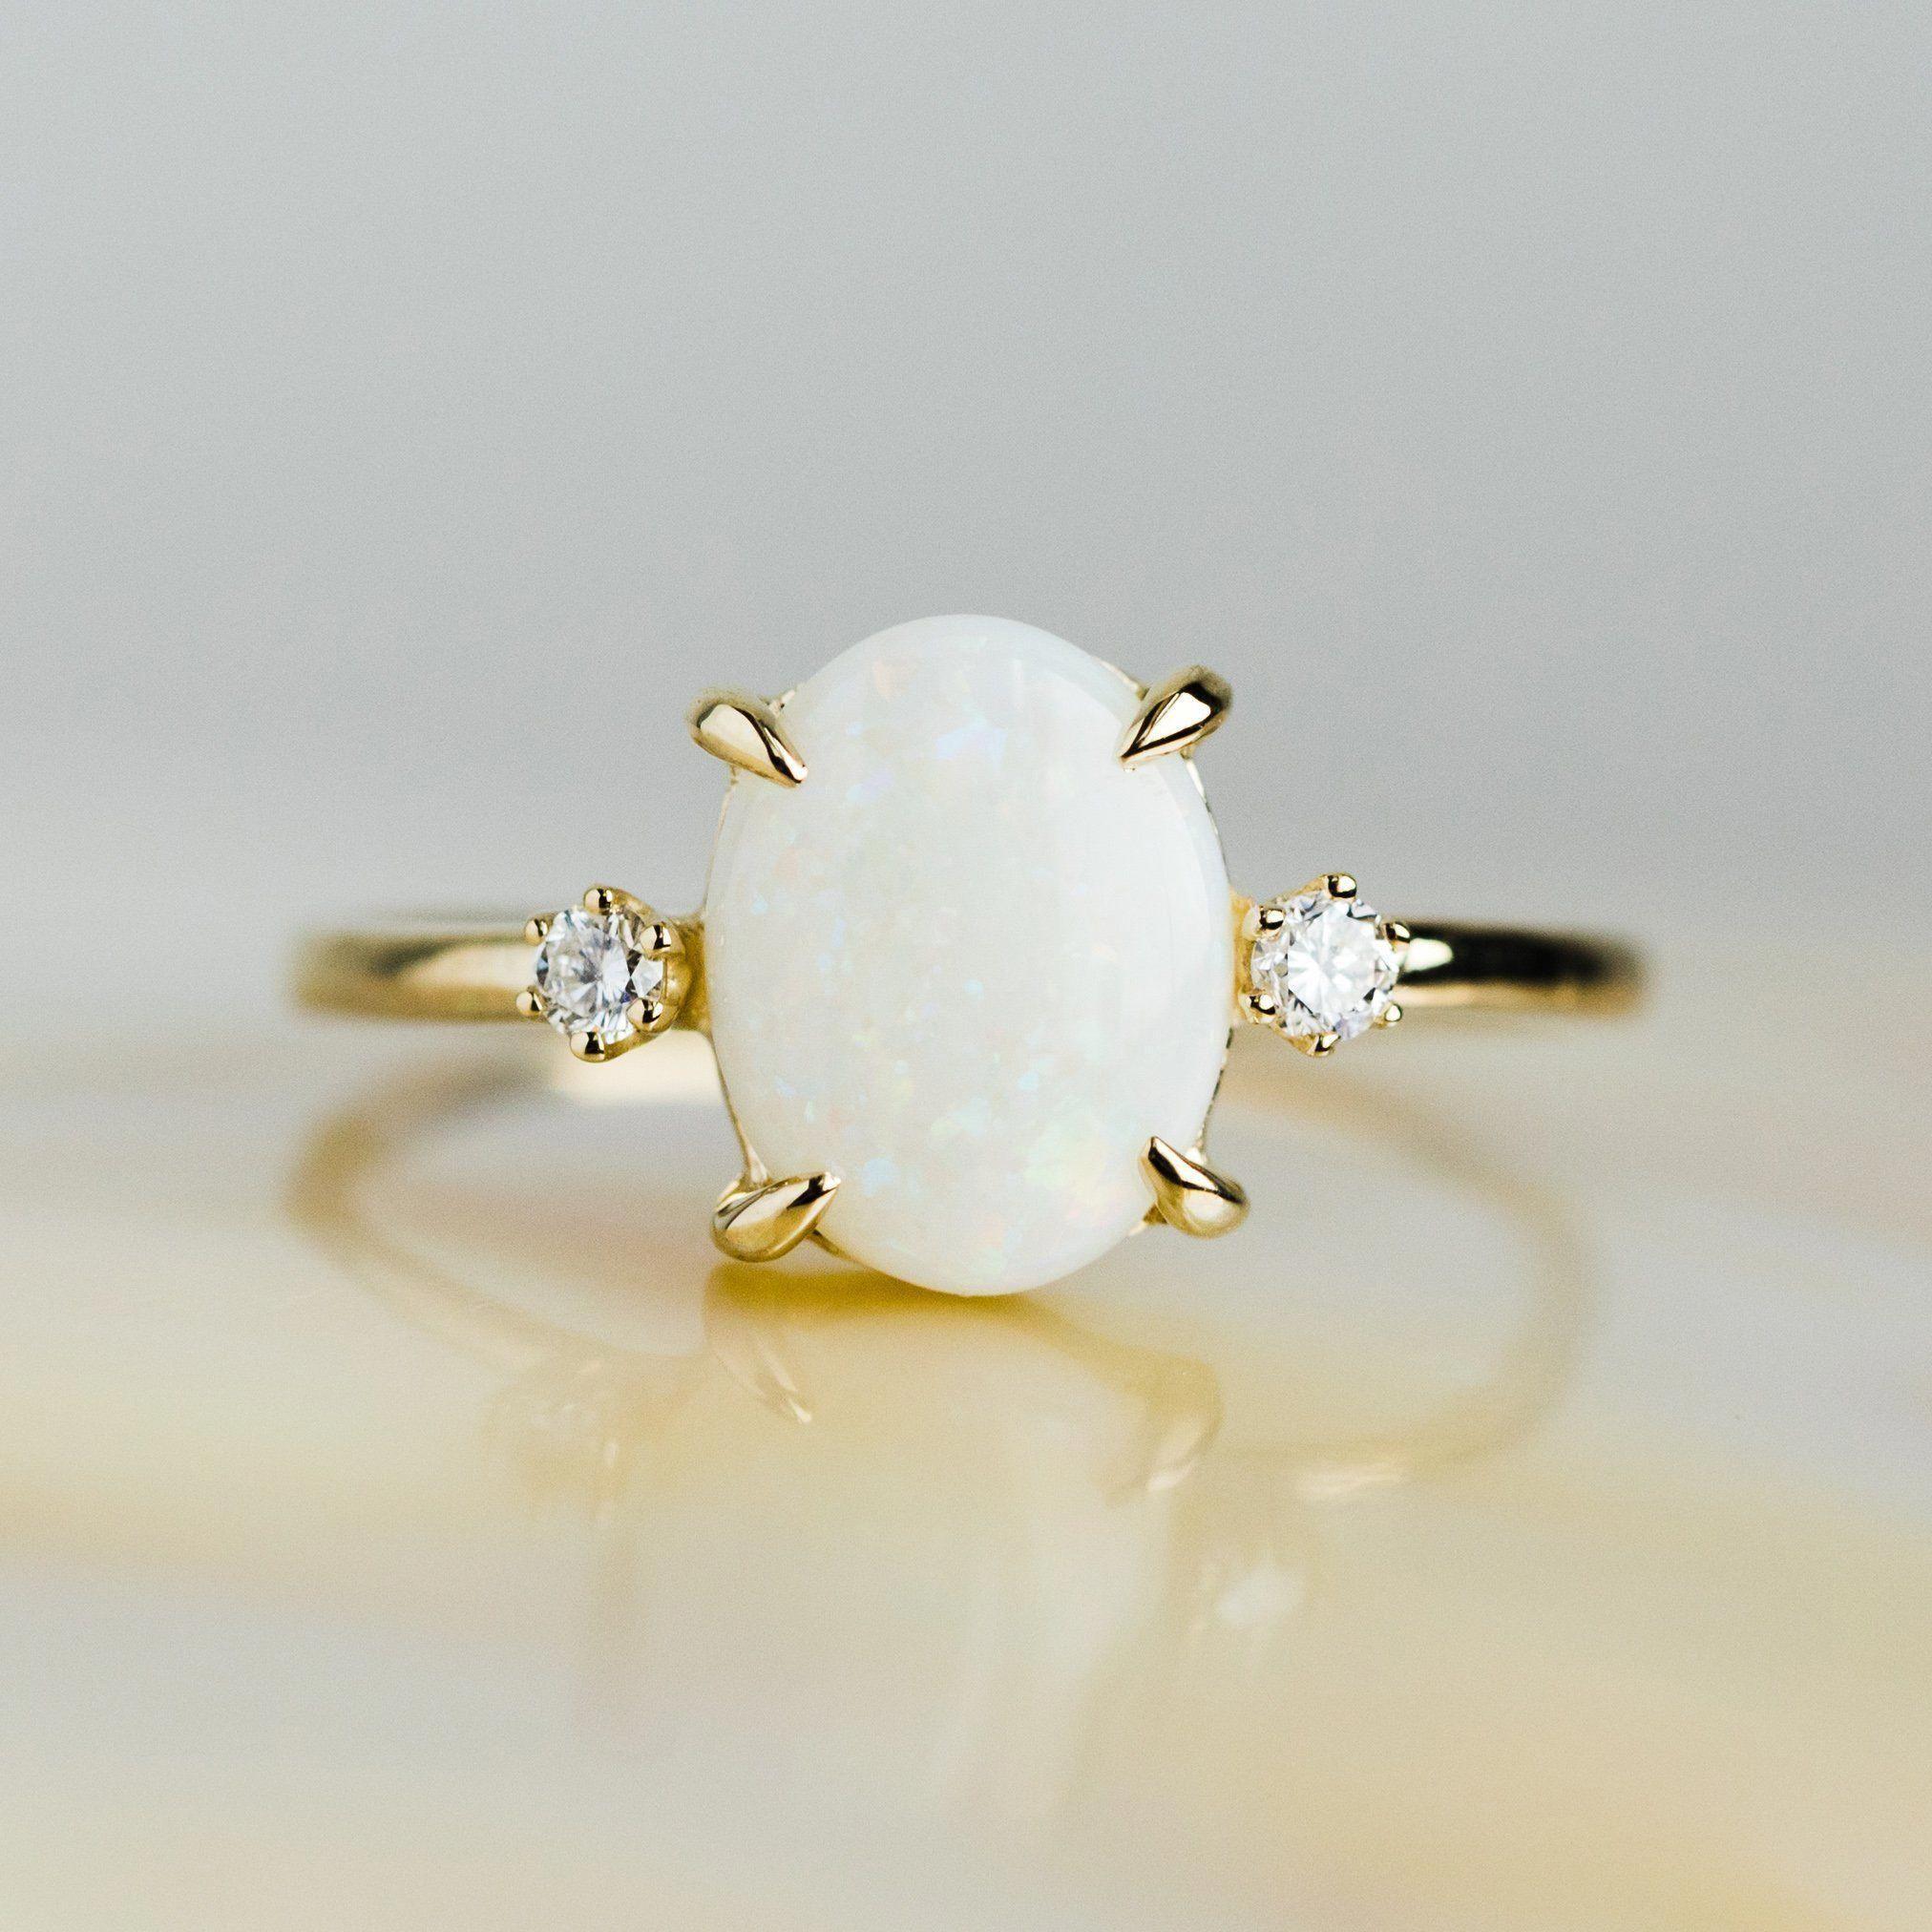 Australian Opal Ring with Diamonds beautyboard